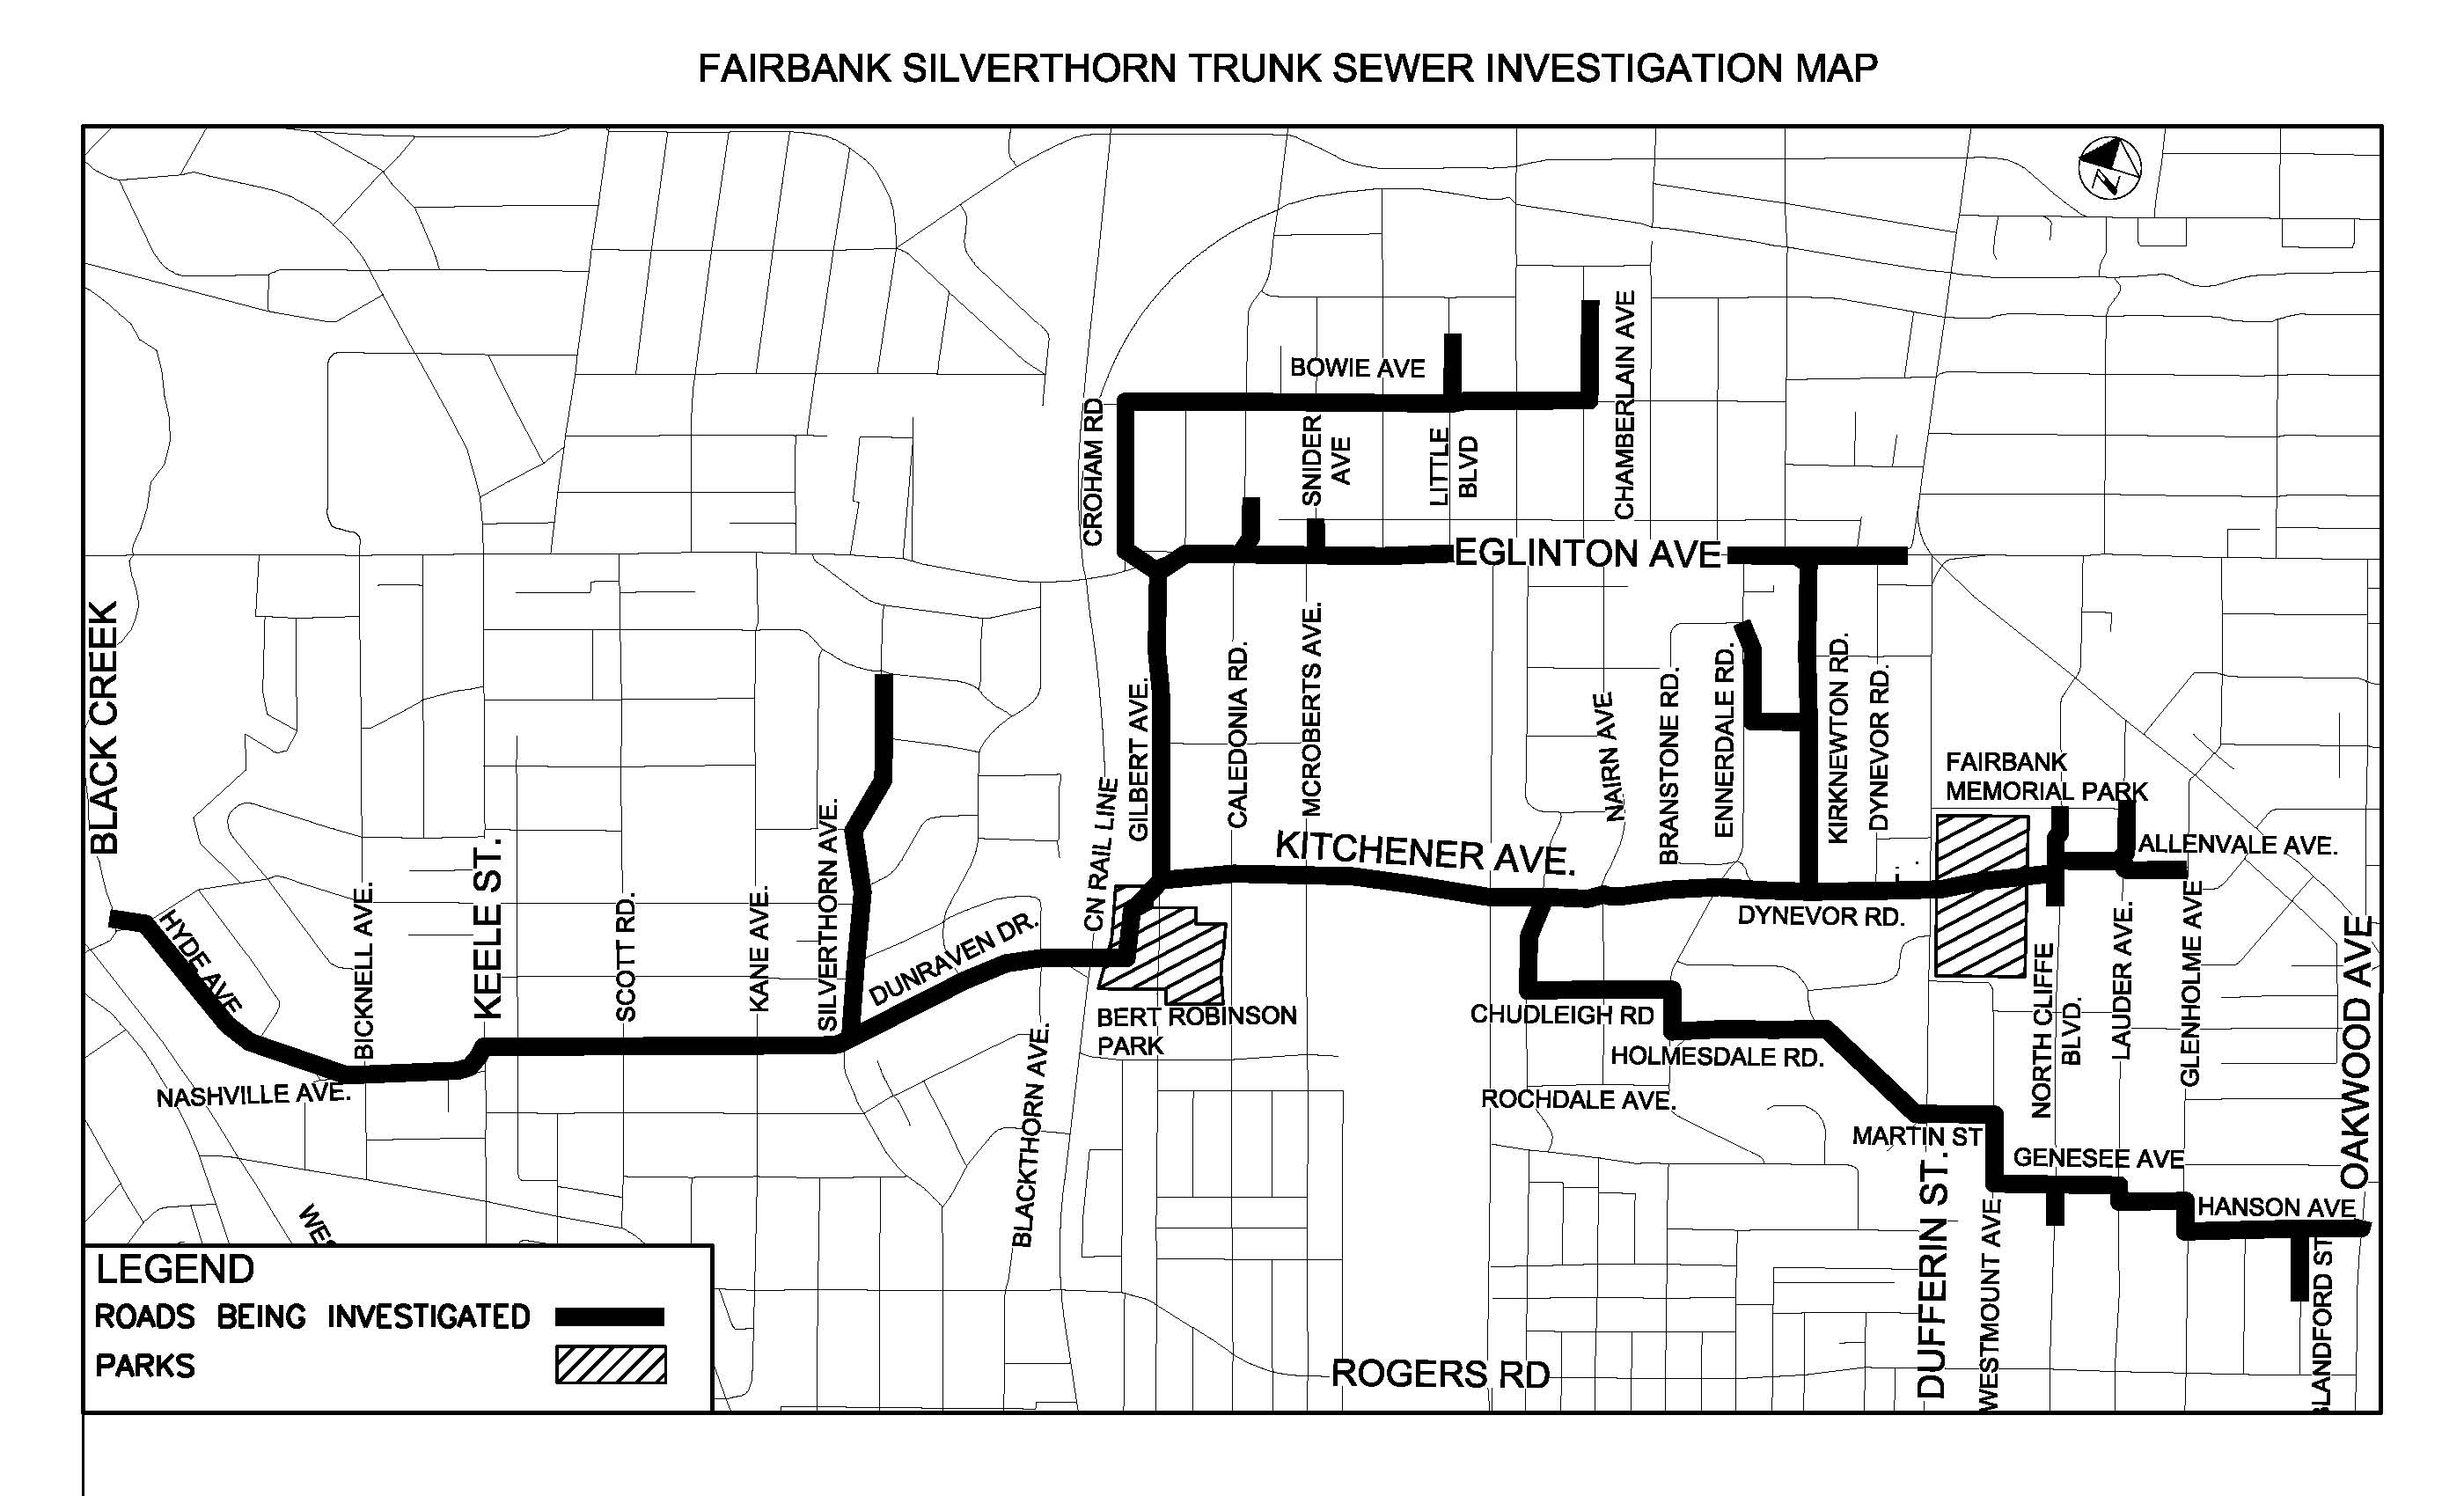 Fairbank trunk sewer map